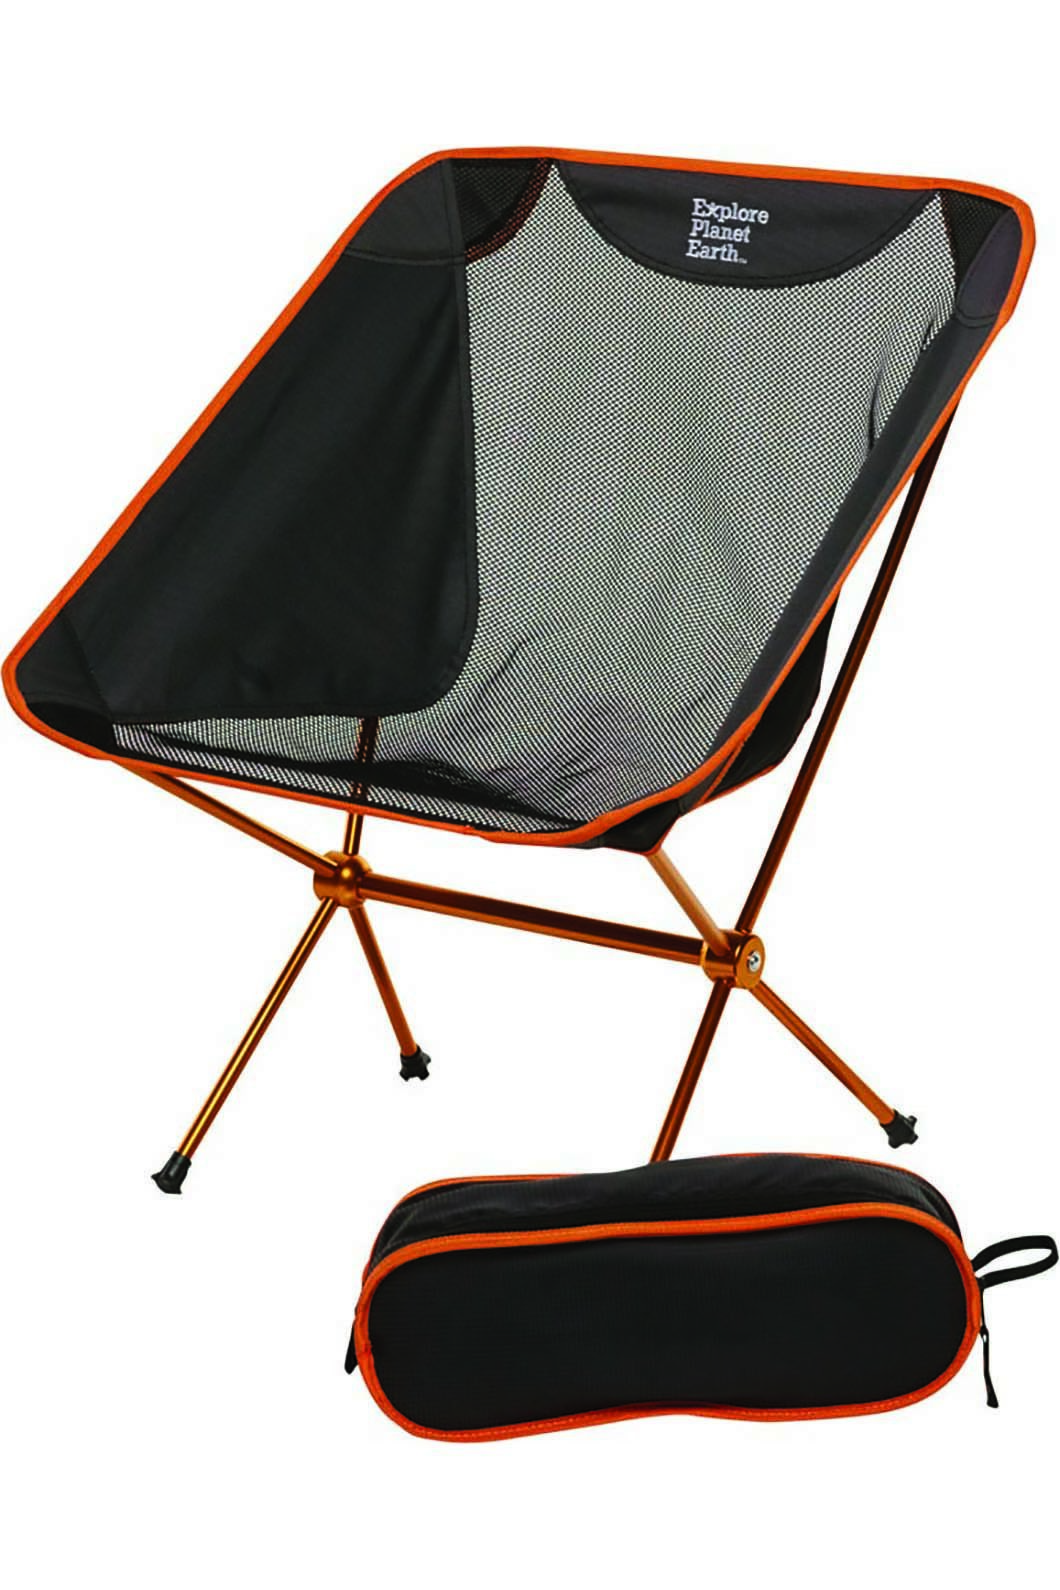 Explore Planet Earth Pegasus Hiking Chair, None, hi-res